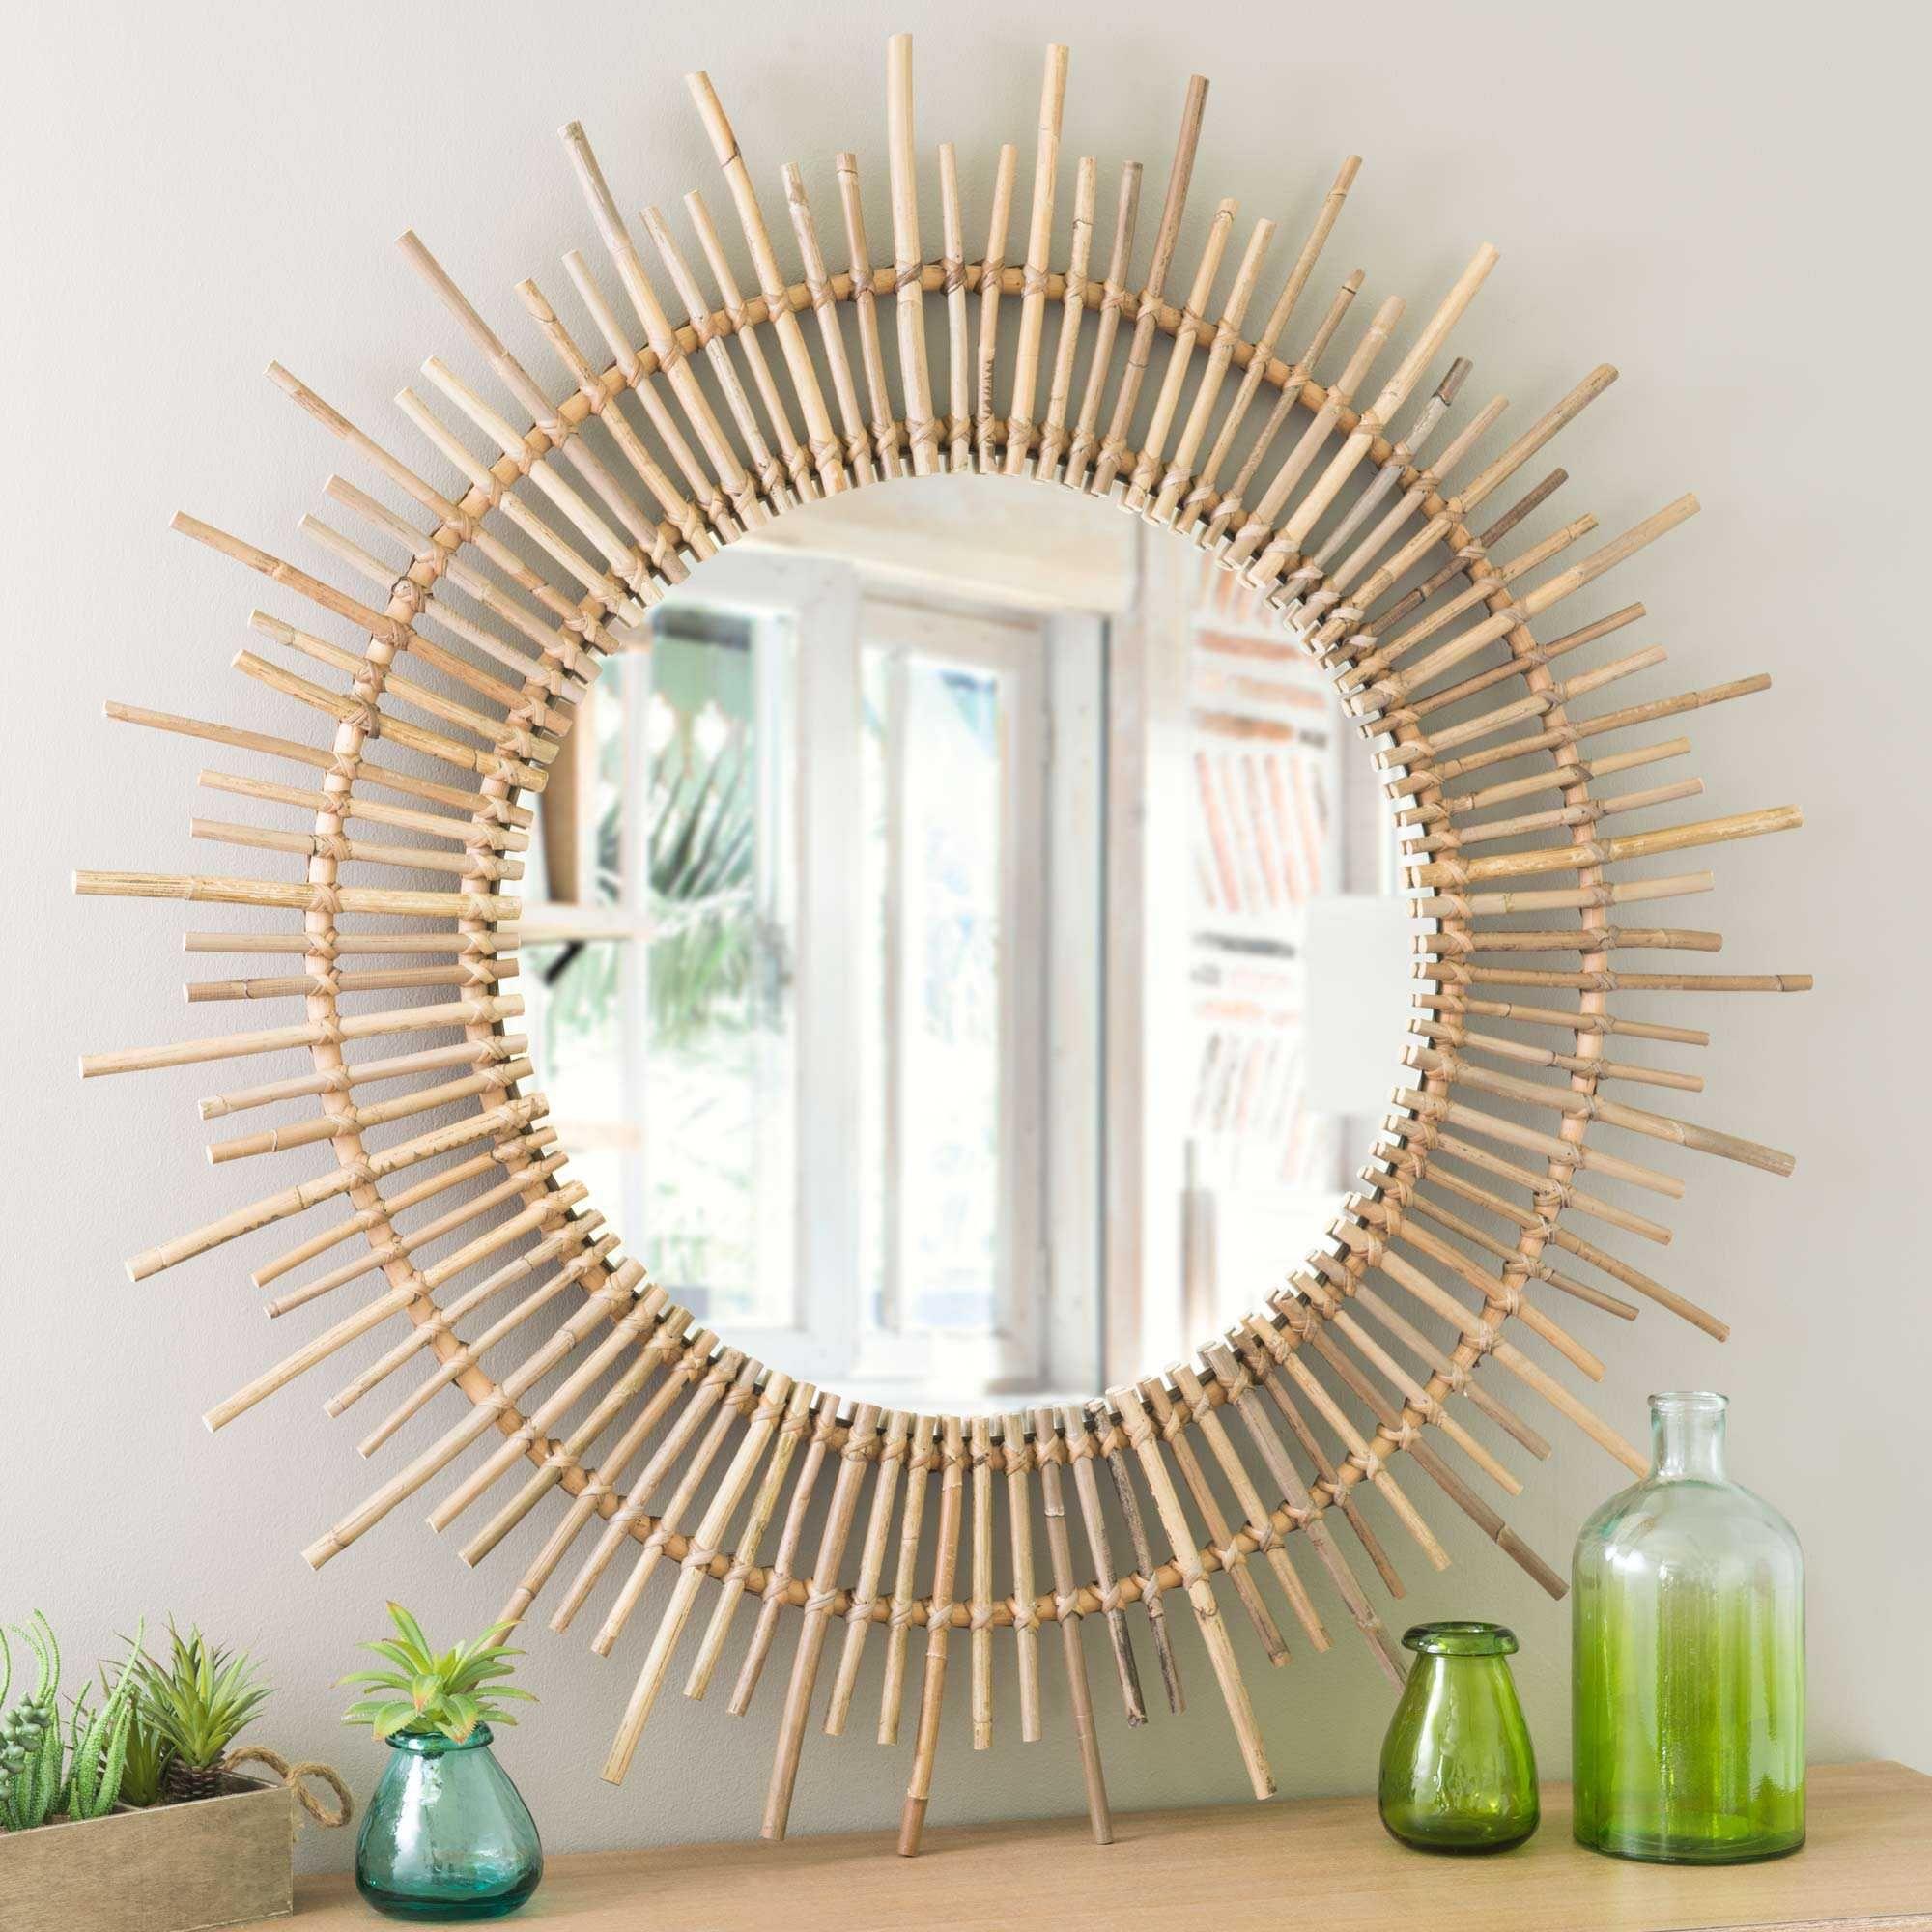 Miroir rond en rotin D 90 cm | Miroir rond, Rotin et Miroirs